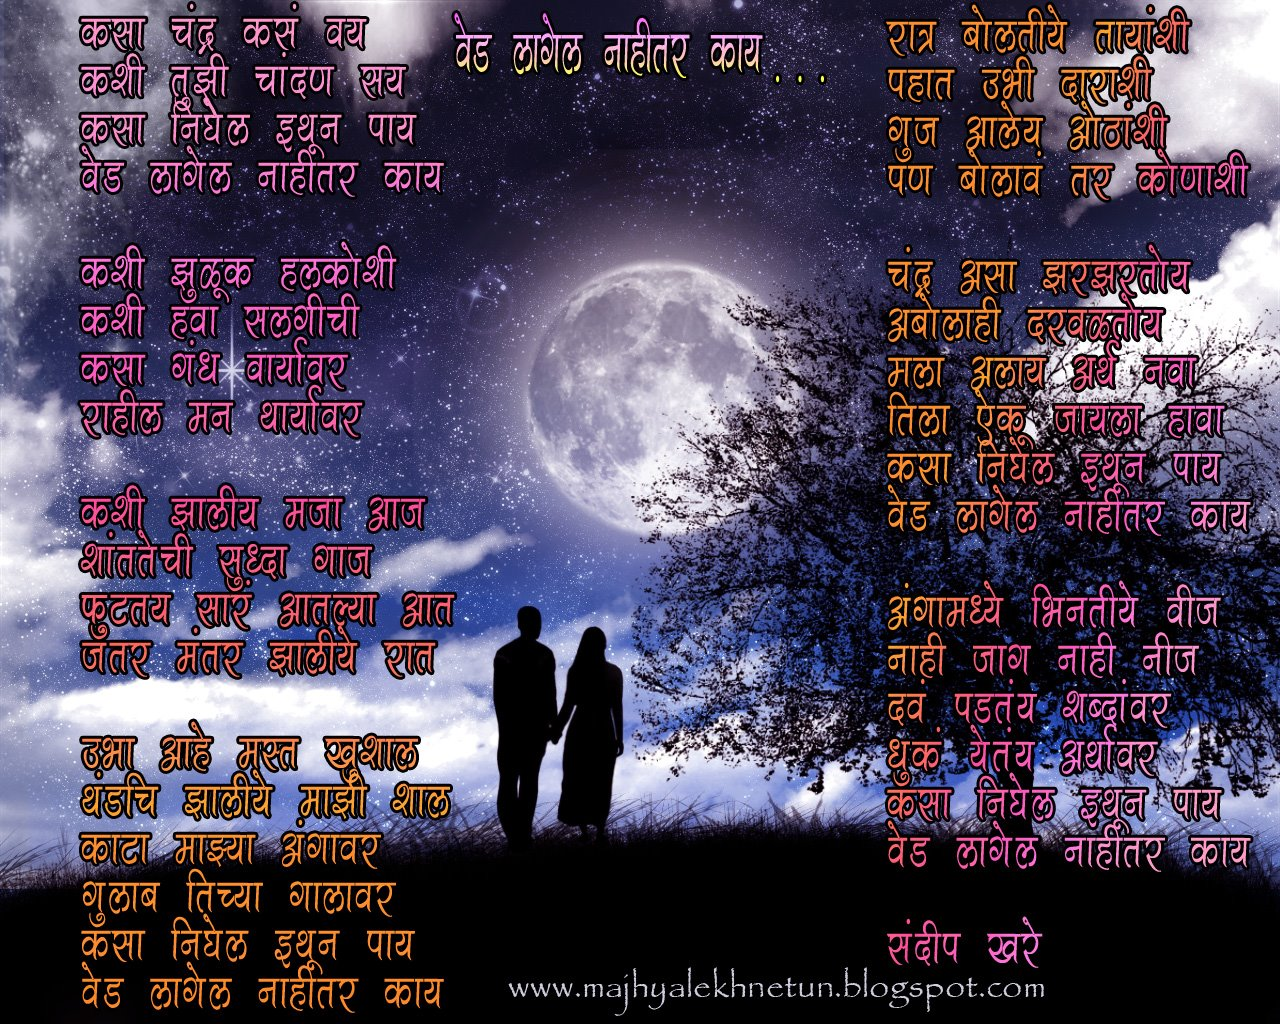 Marathi Wallpaper Facebook | Holidays OO